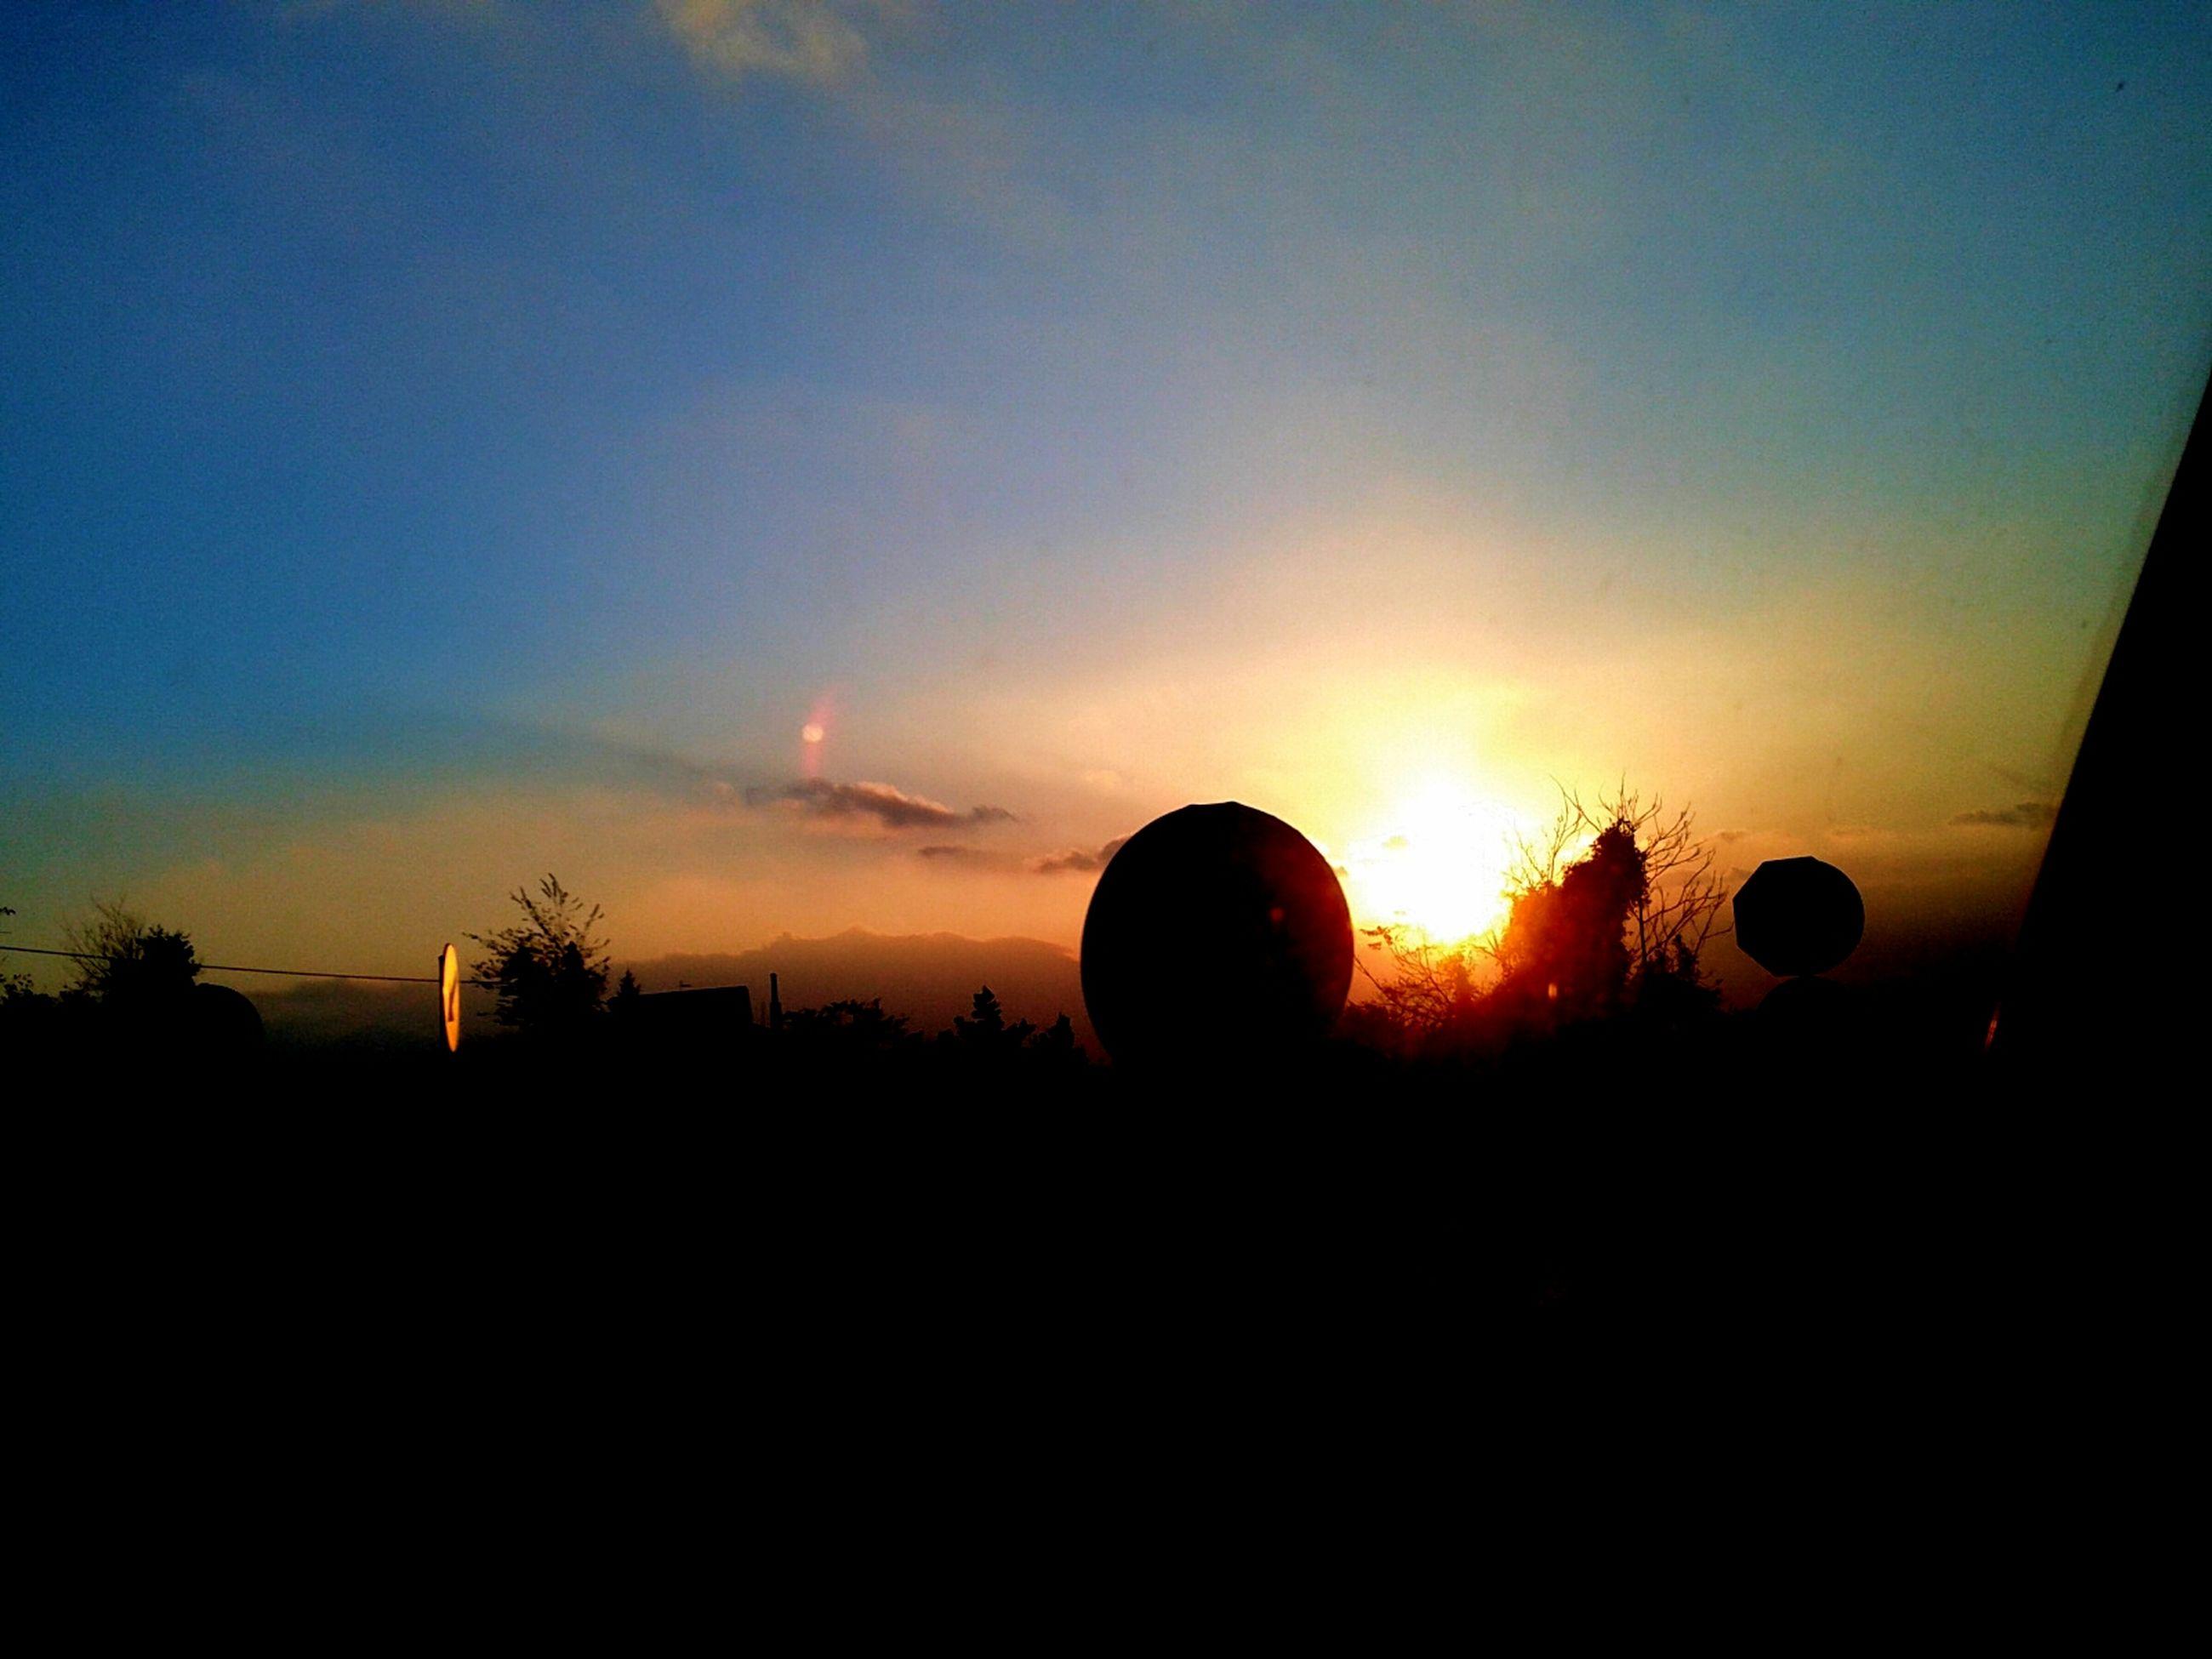 sunset, silhouette, sky, scenics, orange color, beauty in nature, tranquil scene, tranquility, landscape, nature, copy space, dark, sun, idyllic, outdoors, cloud - sky, cloud, moody sky, field, no people